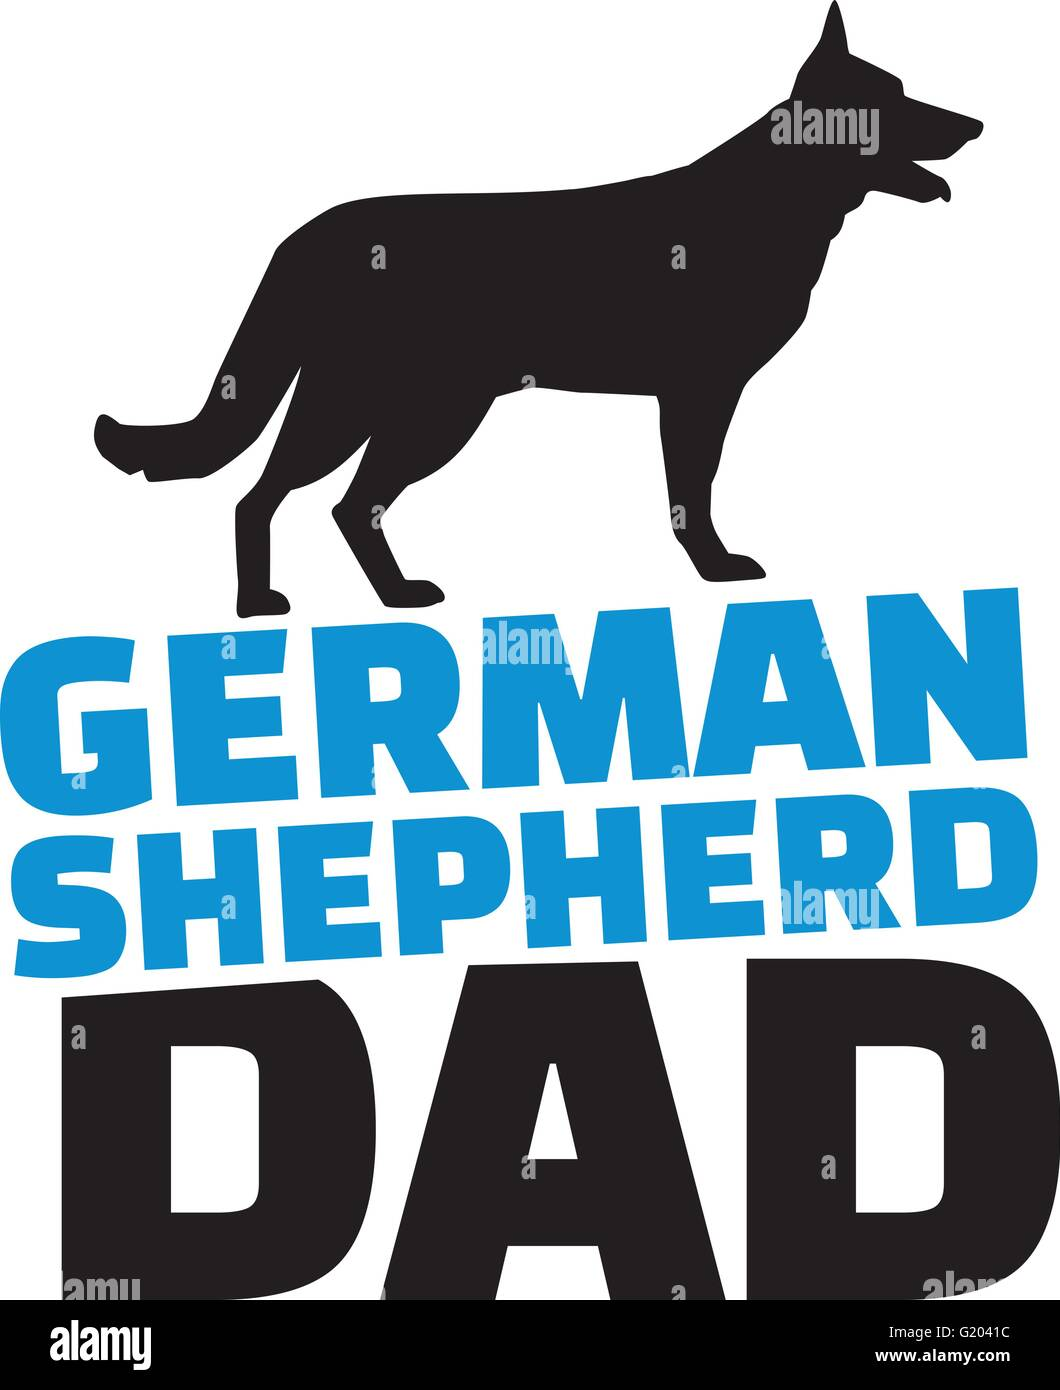 German Shepherd dad with dog silhouette - Stock Vector